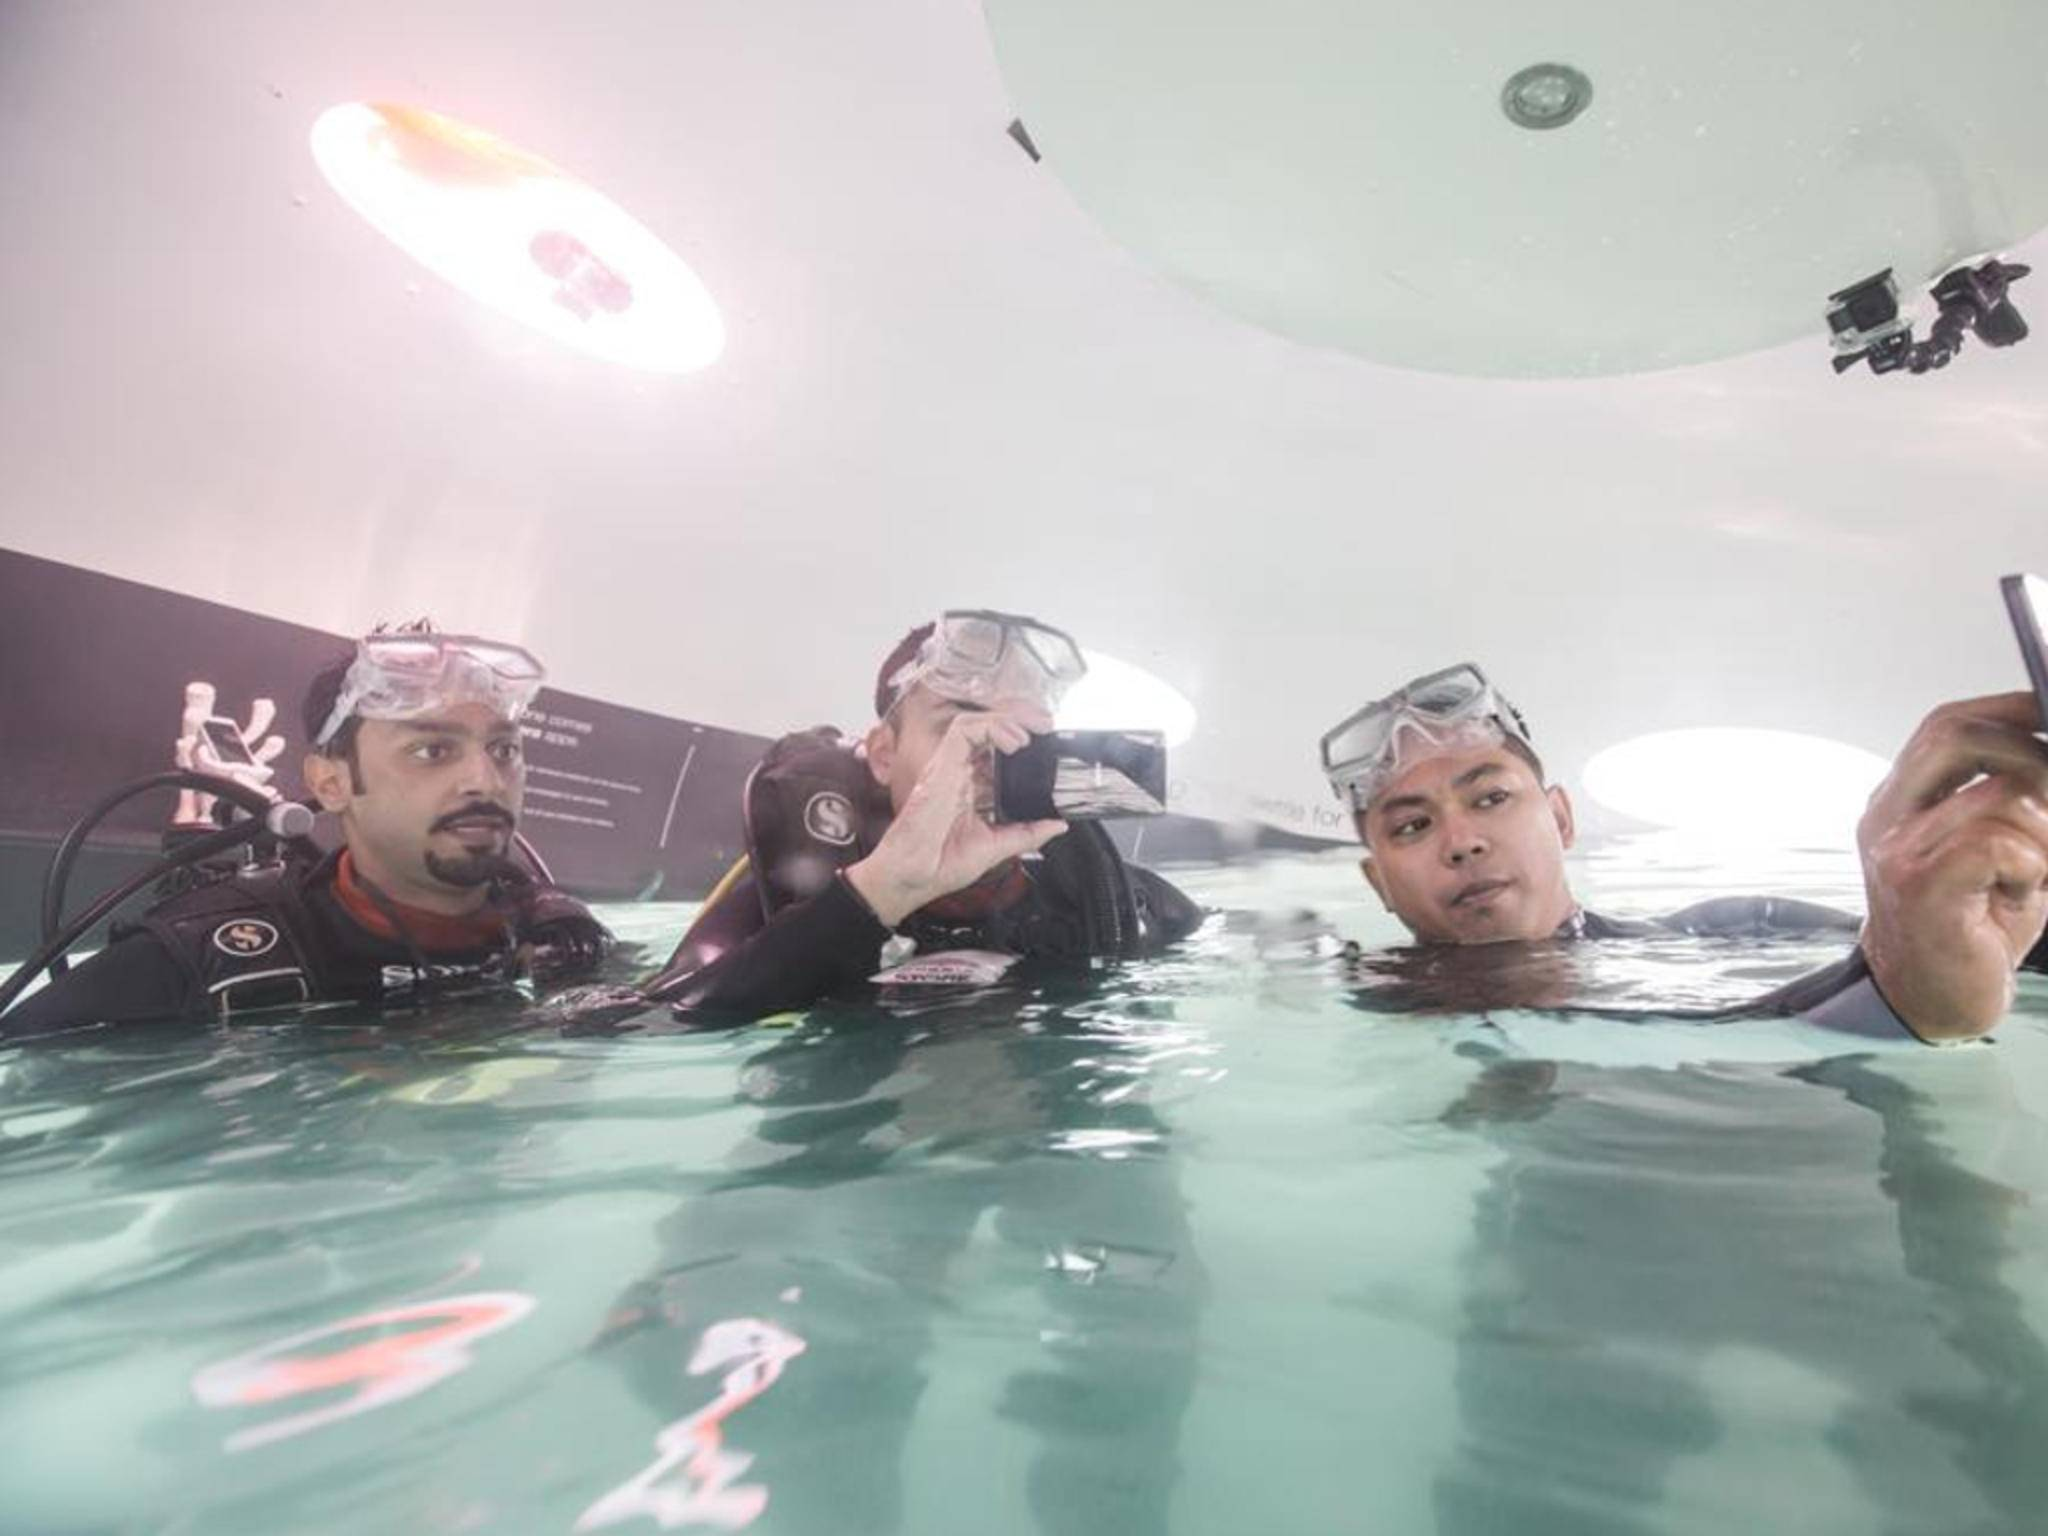 Im Xperia Aquatech Store lassen sich Xperia-Smartphones unter Wasser testen.